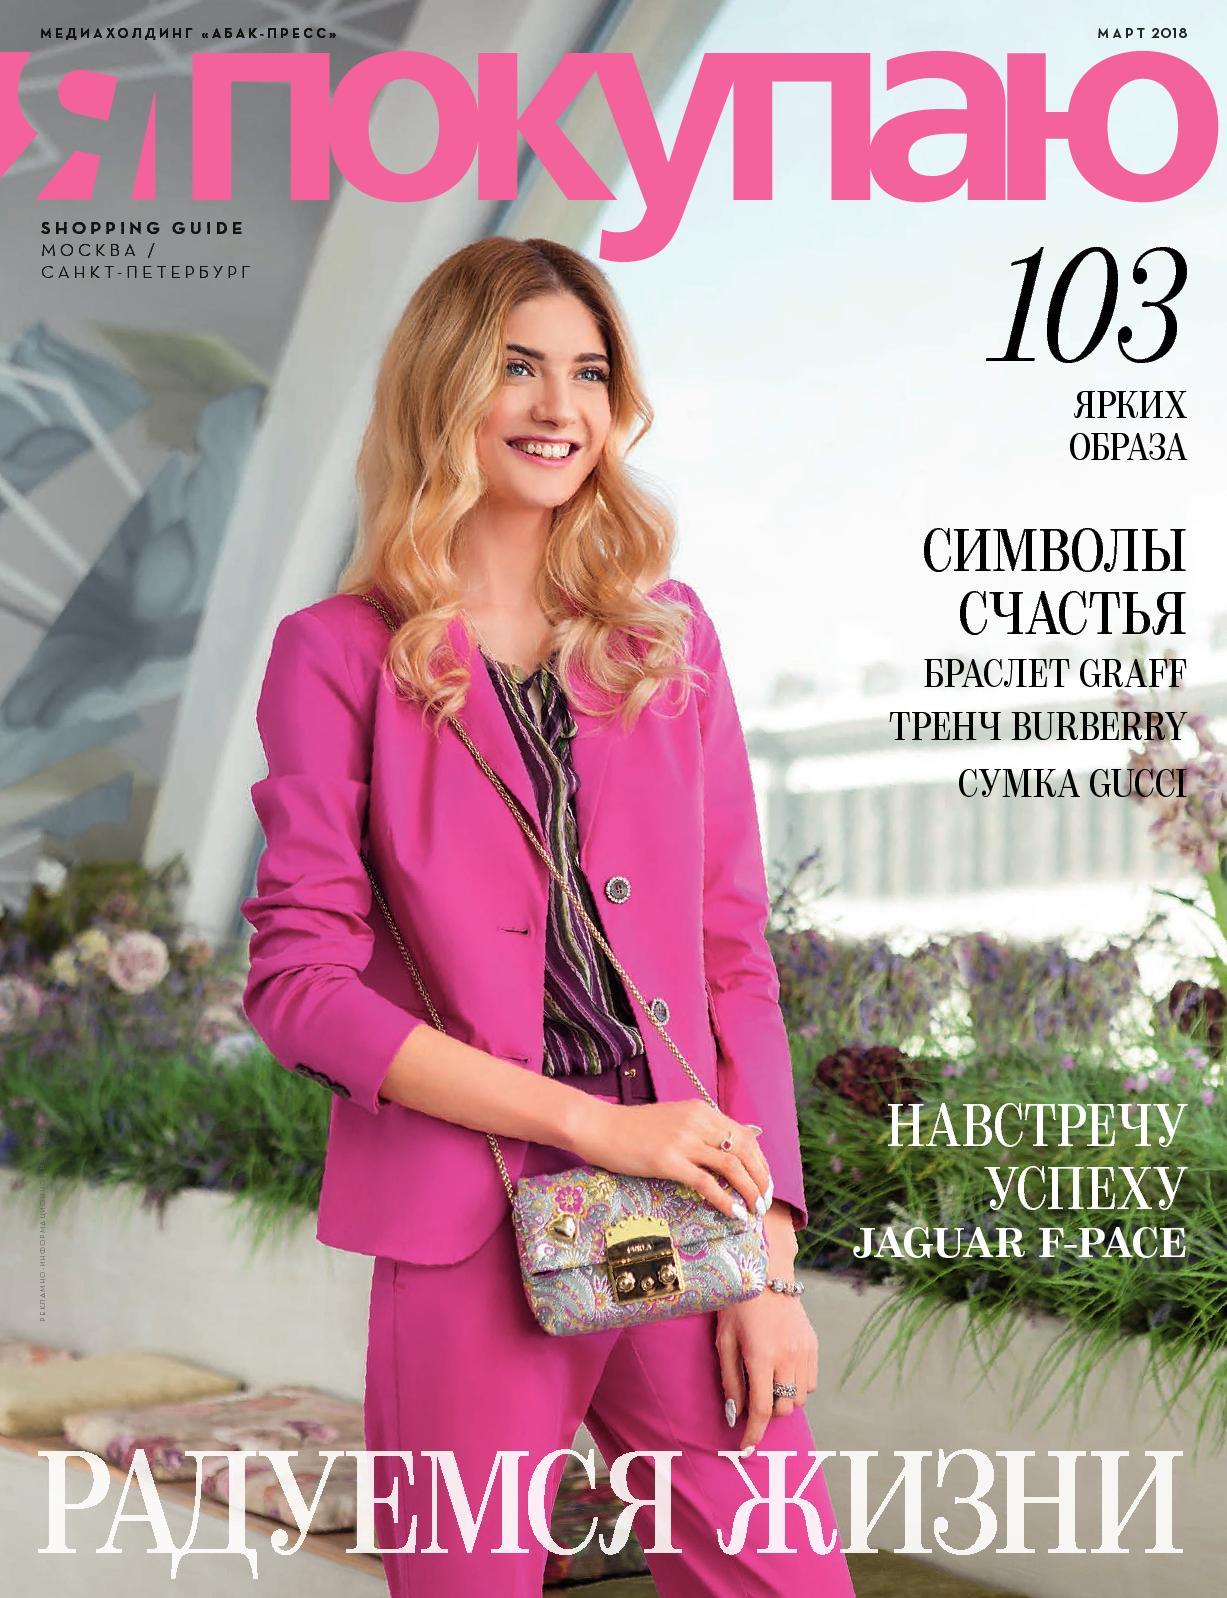 13ef537de9a Calaméo - Shopping Guide «Я Покупаю. Москва - Санкт-Петербург»